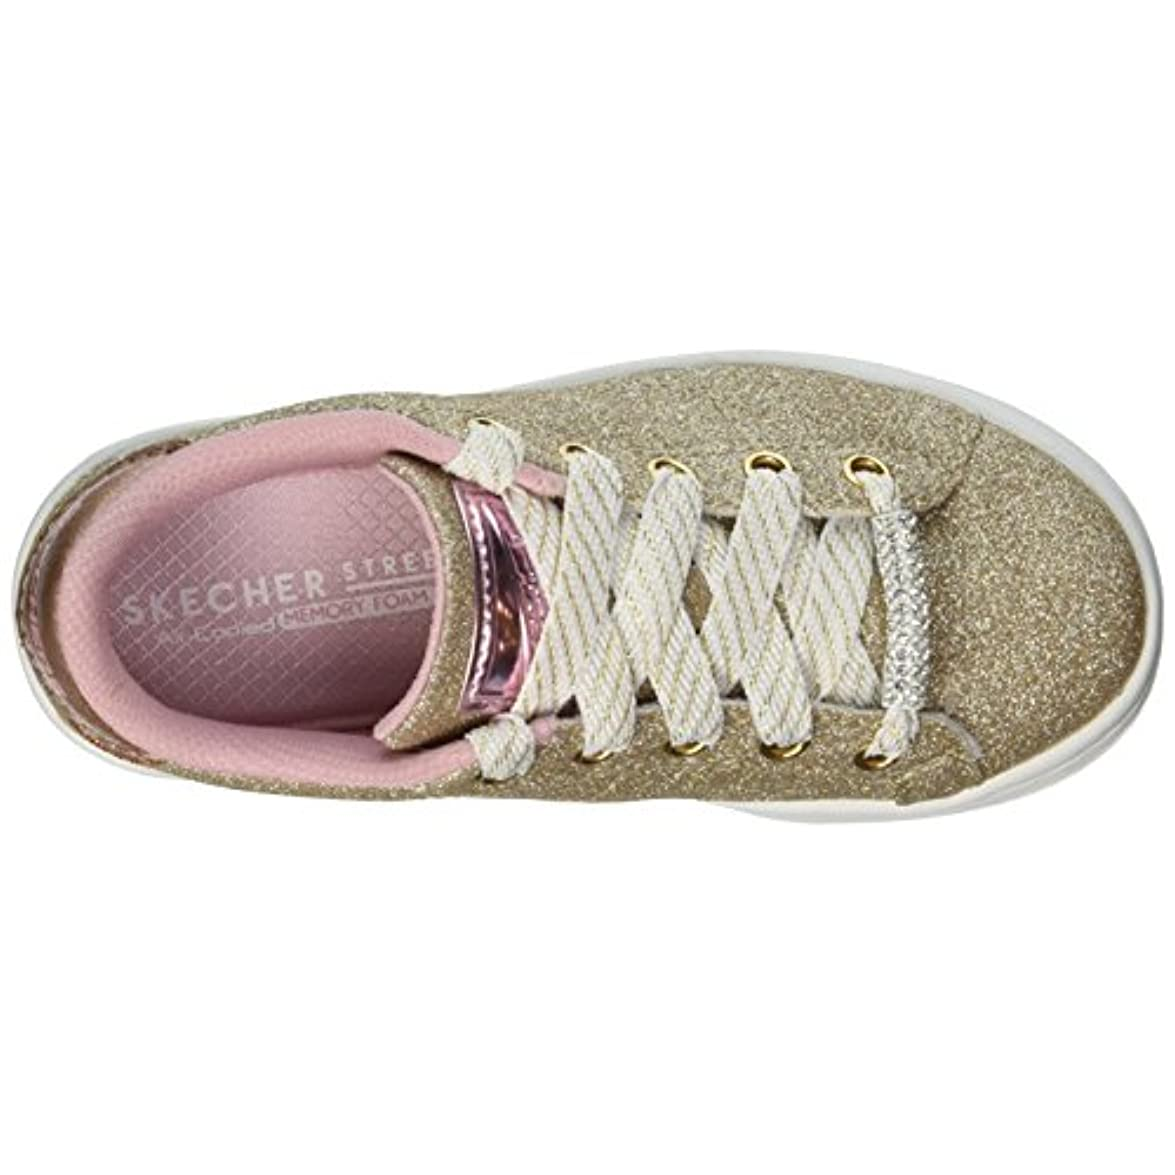 Skechers Scarpe Sneakers Omne Shimmer Street Lace Up Donna 84460l-gold